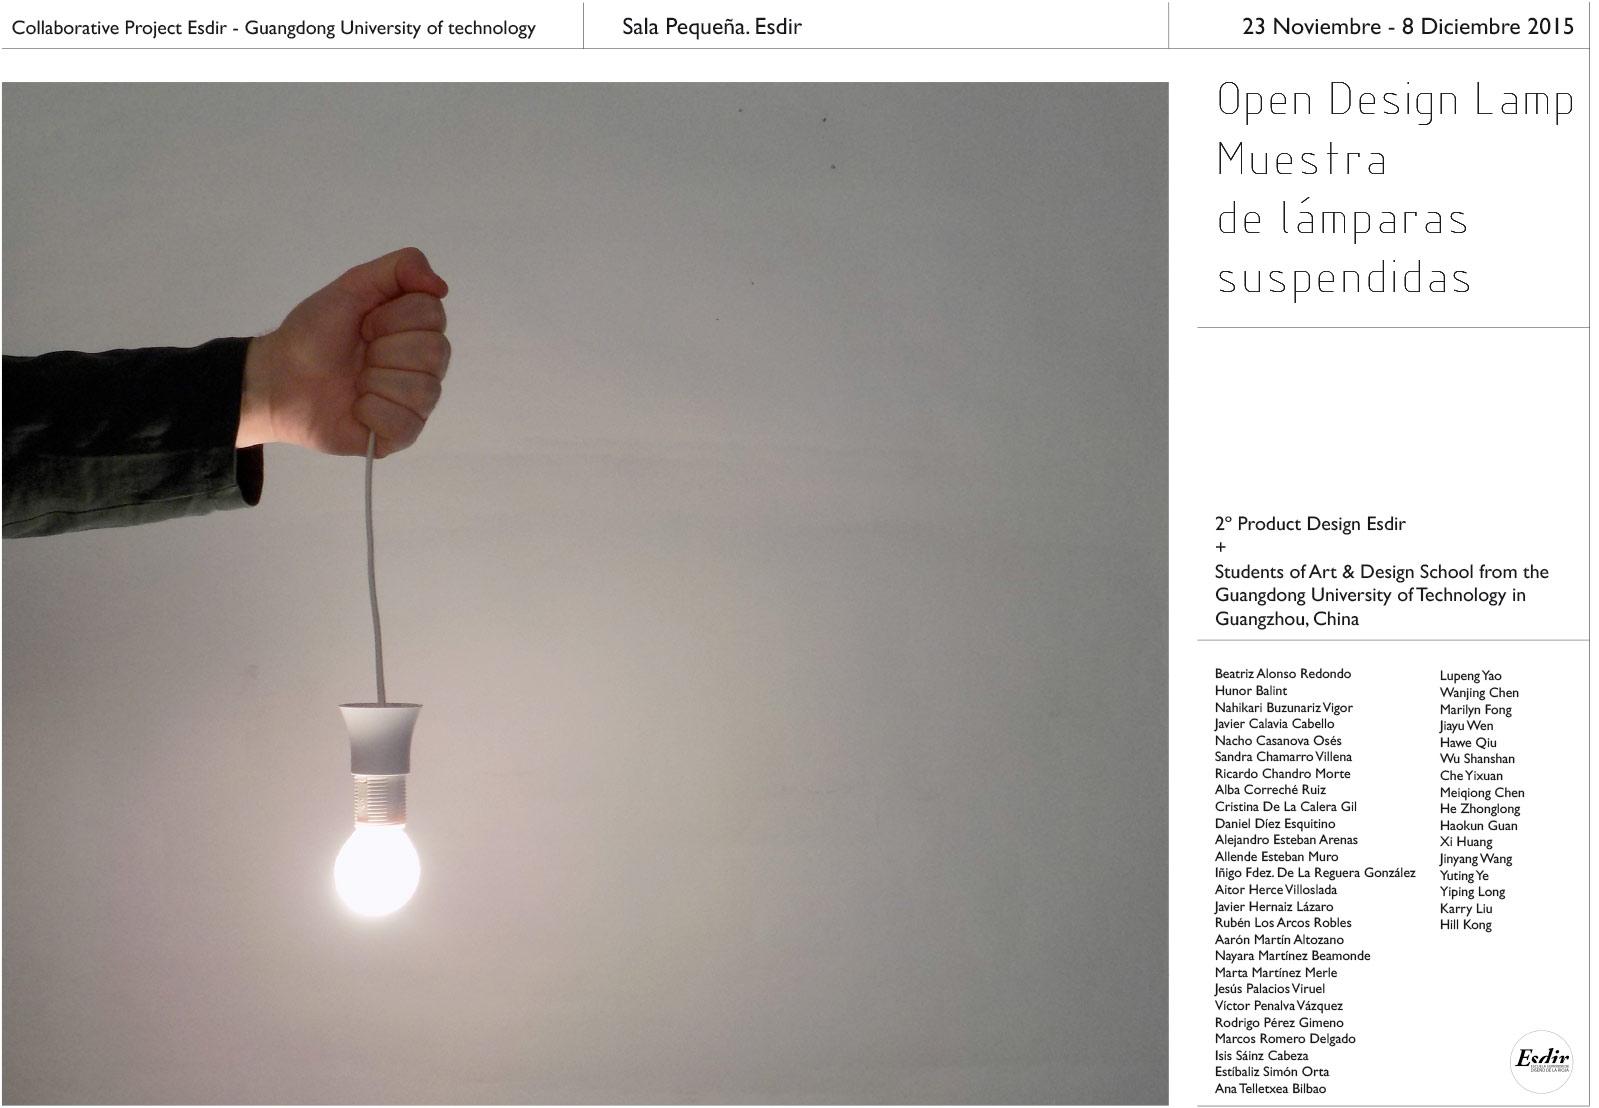 Exposición de lamparas suspendidas, proyecto OpenDesign.